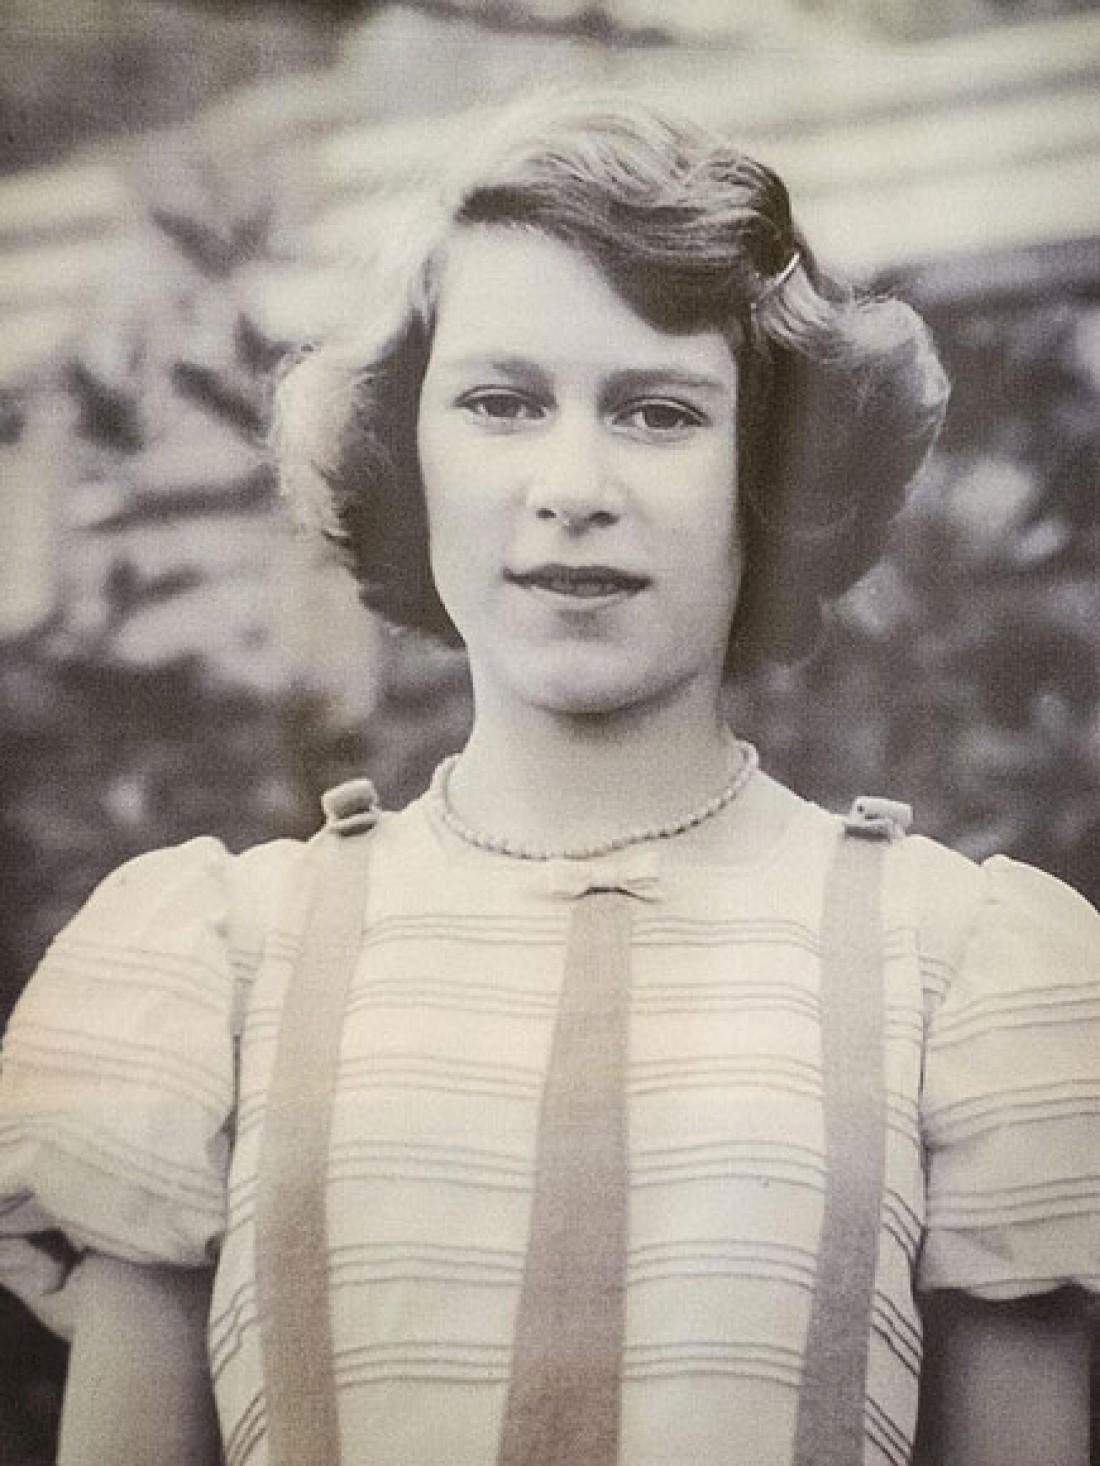 Королева Елизавета II в 13-летнем возрасте